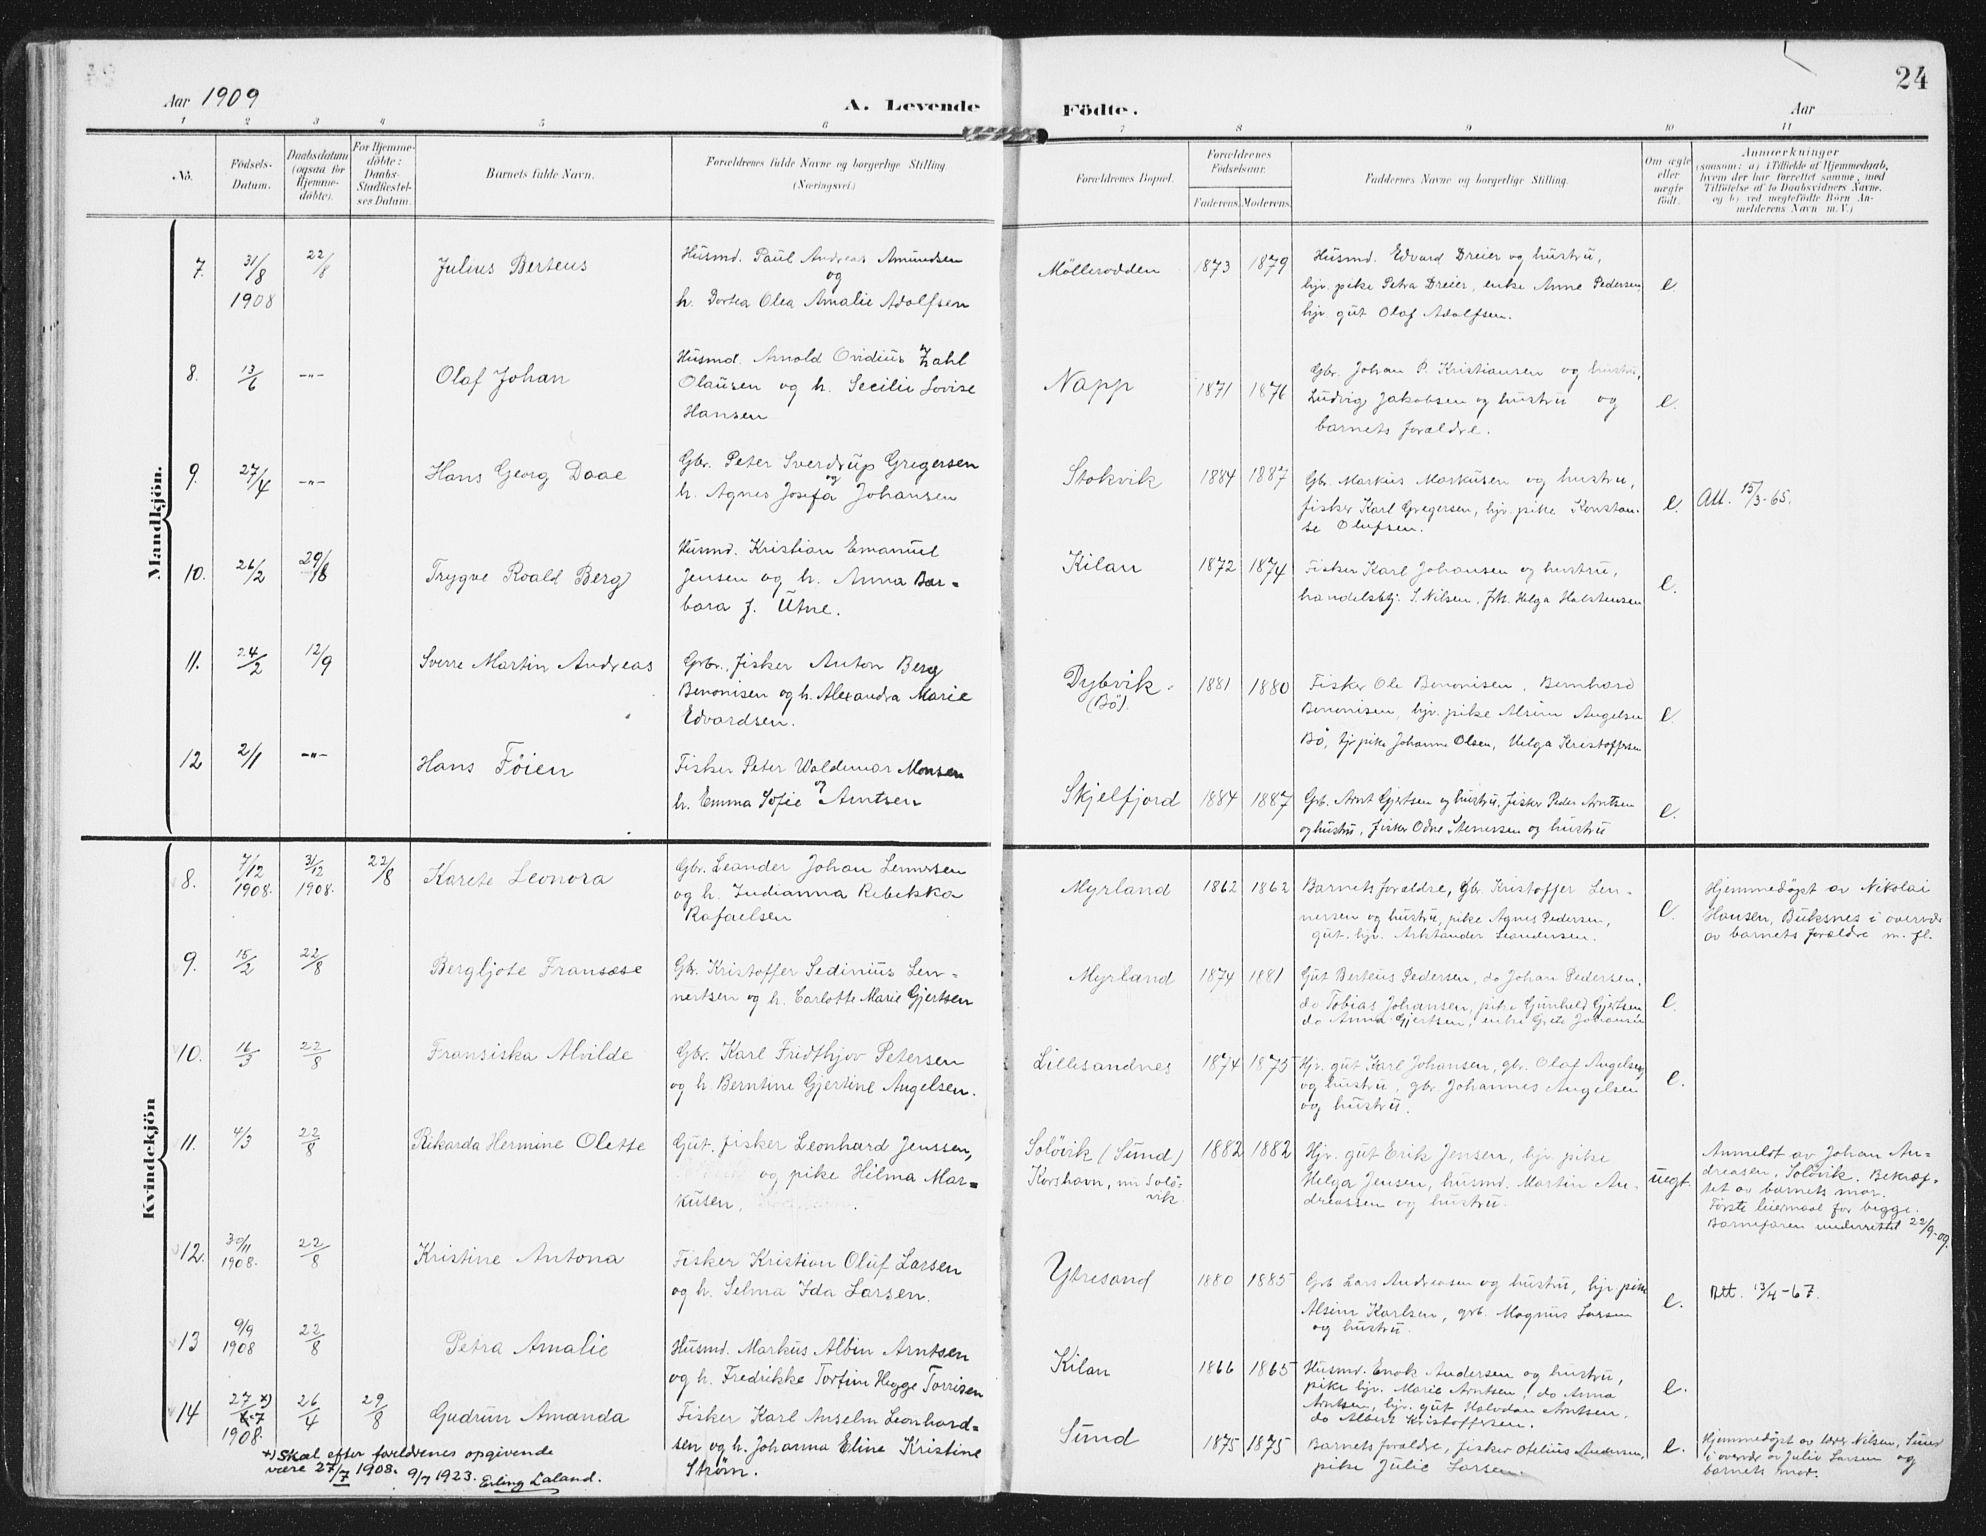 SAT, Ministerialprotokoller, klokkerbøker og fødselsregistre - Nordland, 885/L1206: Ministerialbok nr. 885A07, 1905-1915, s. 24